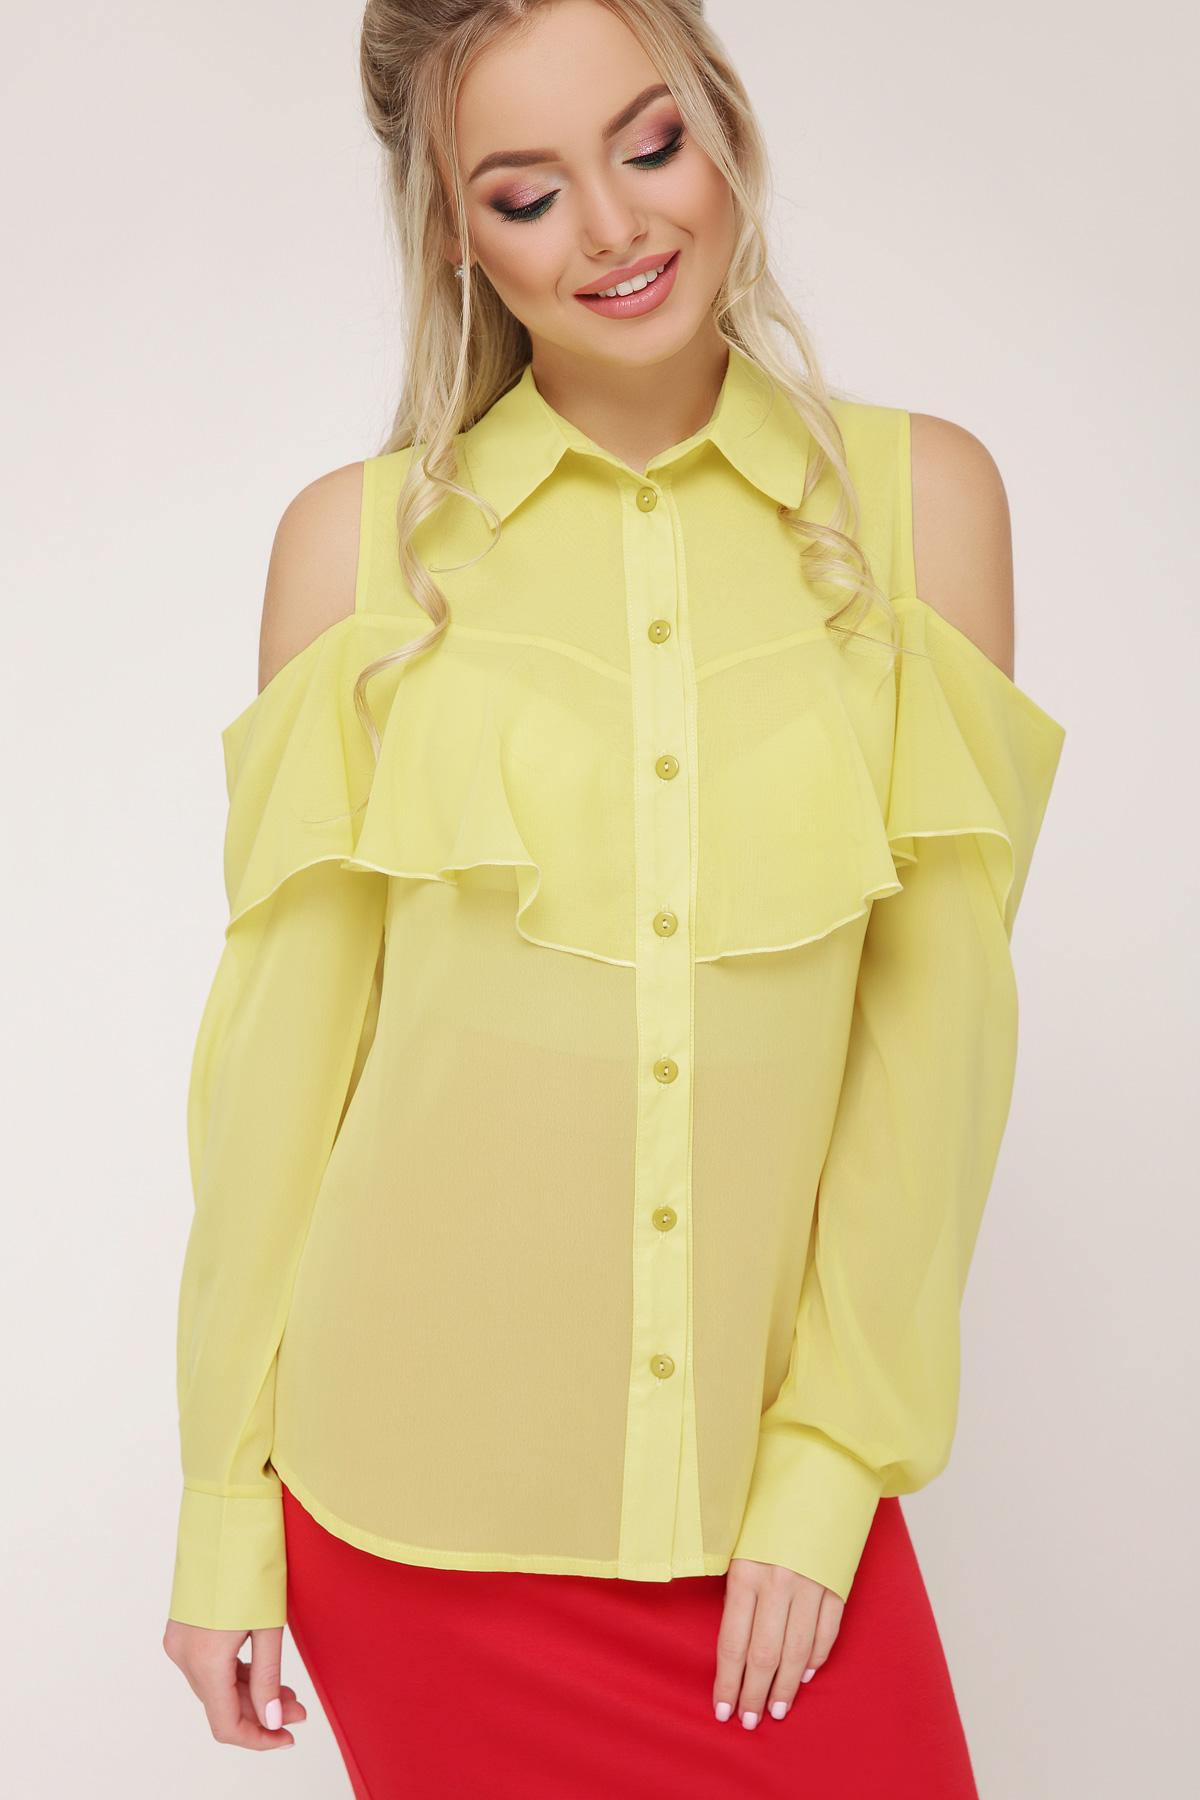 9ace30133ce желтая блузка из шифона. блуза Джанина д р. Цвет  желтый